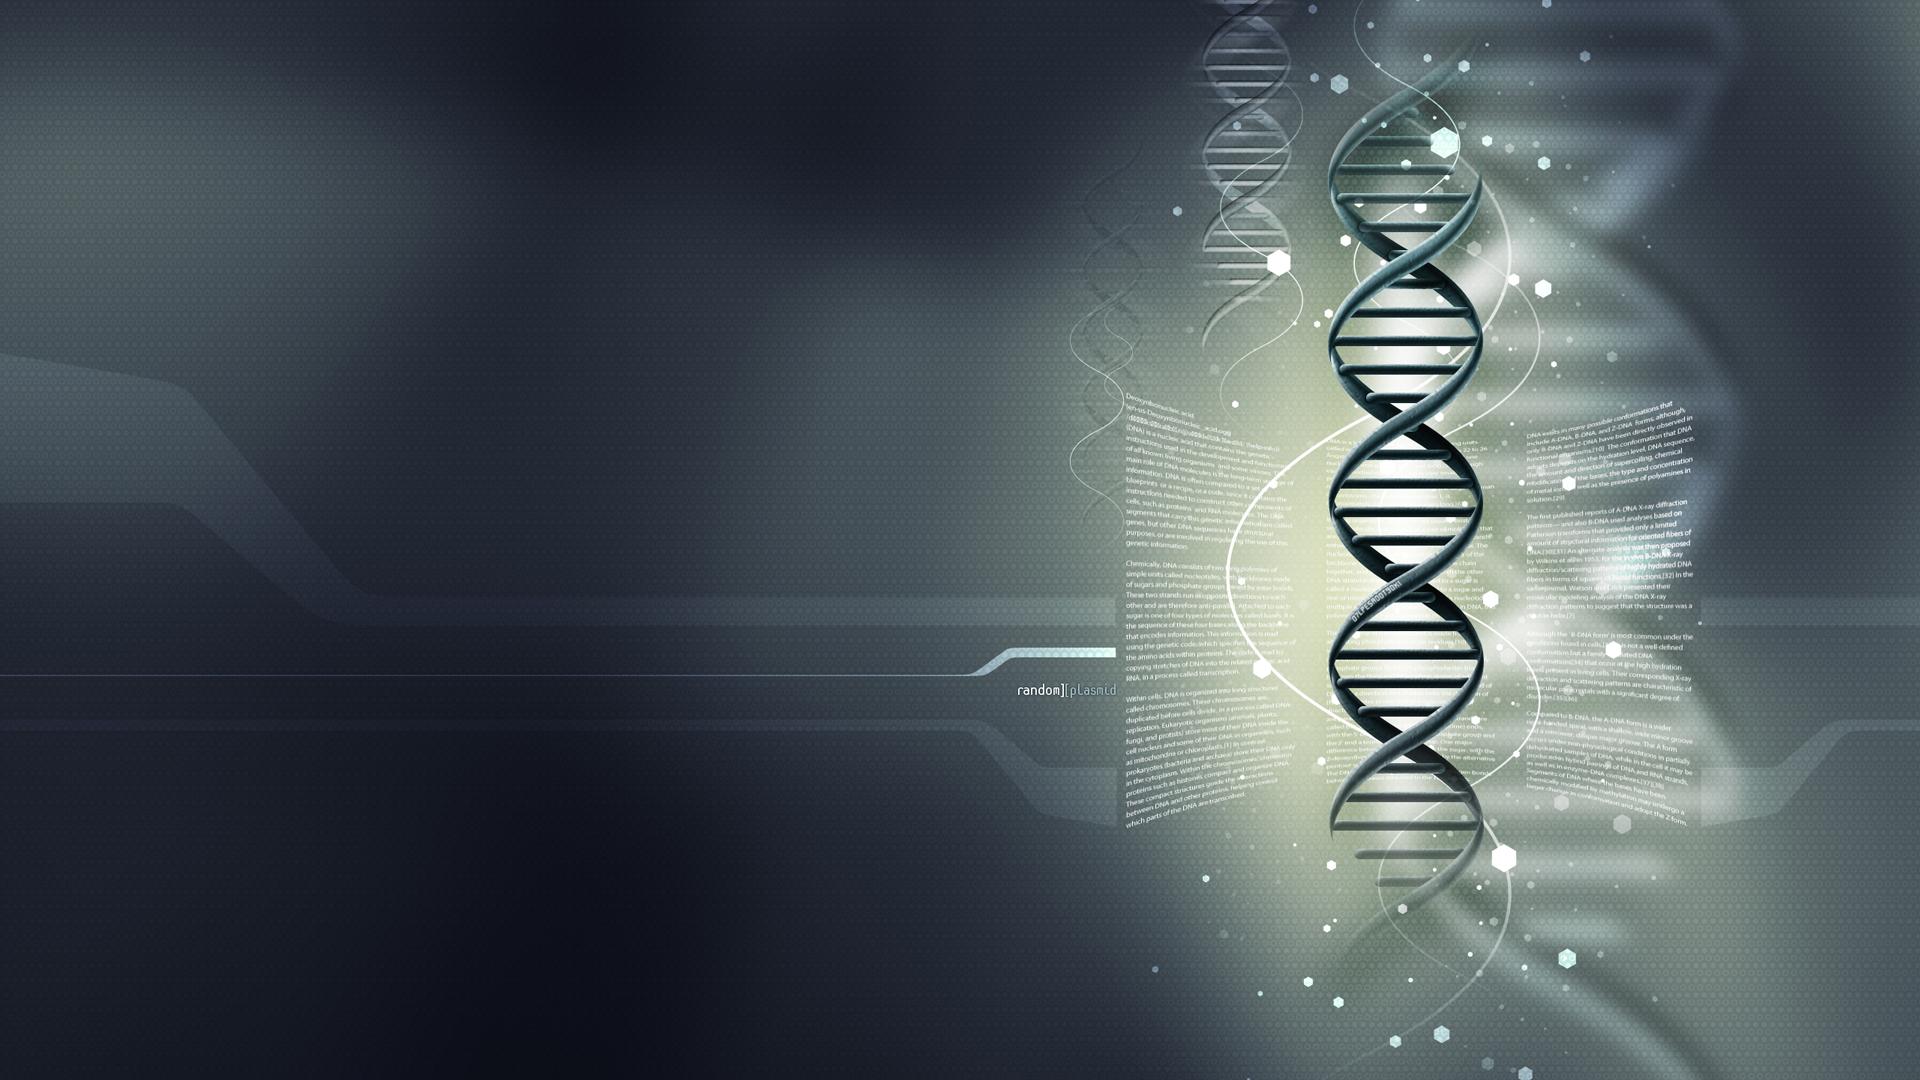 science dna plasmid double helix 863575 1920x1080